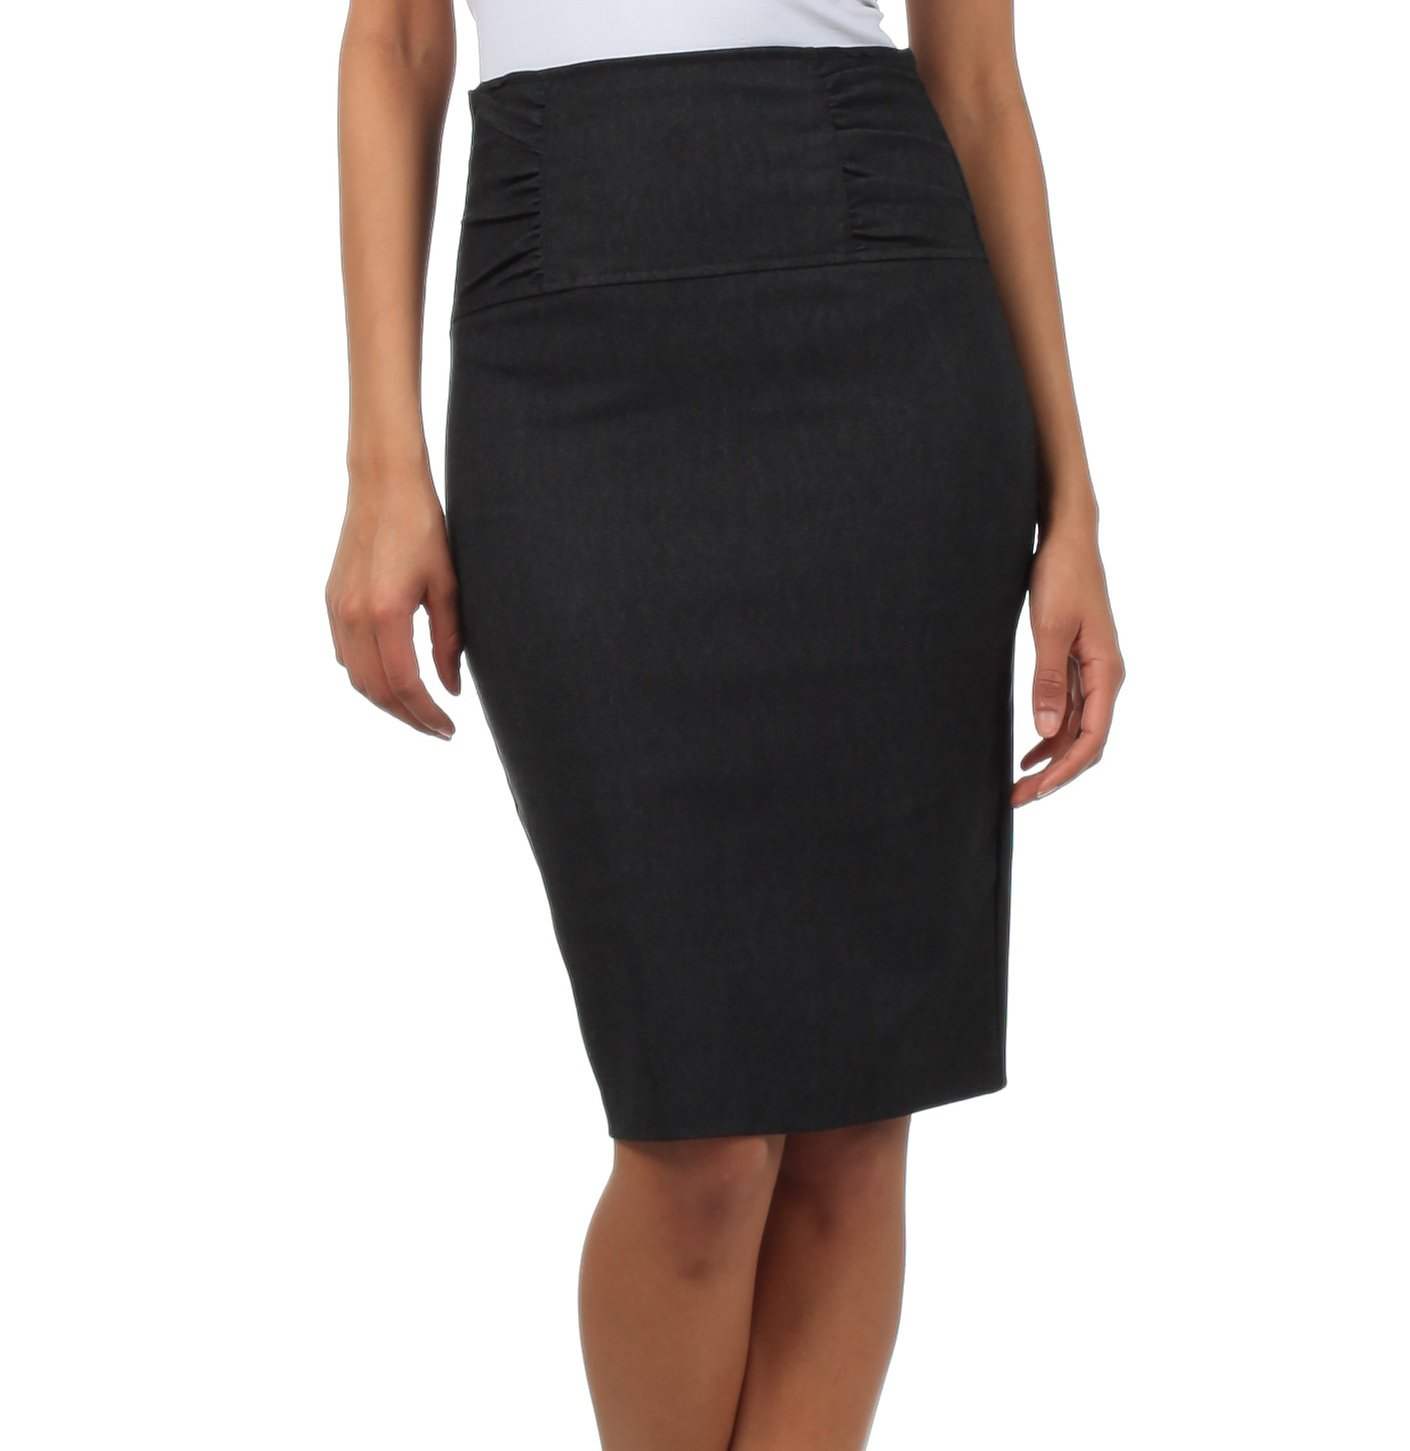 IMI-5235 Petite High Waist Stretch Pencil Skirt With Shirred Waist Detail - Charcoal / 3X